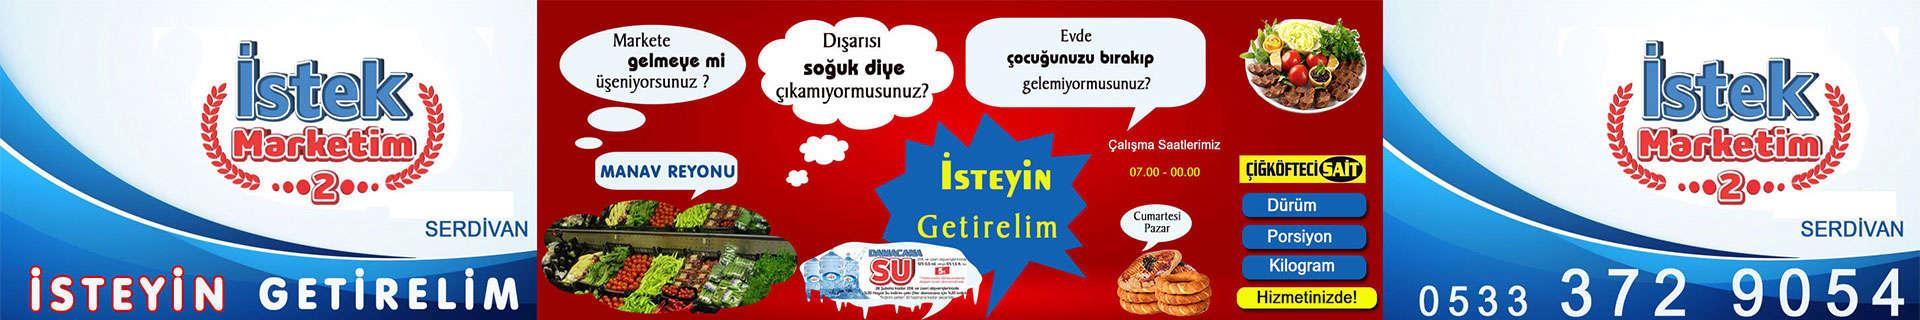 istek_marketim